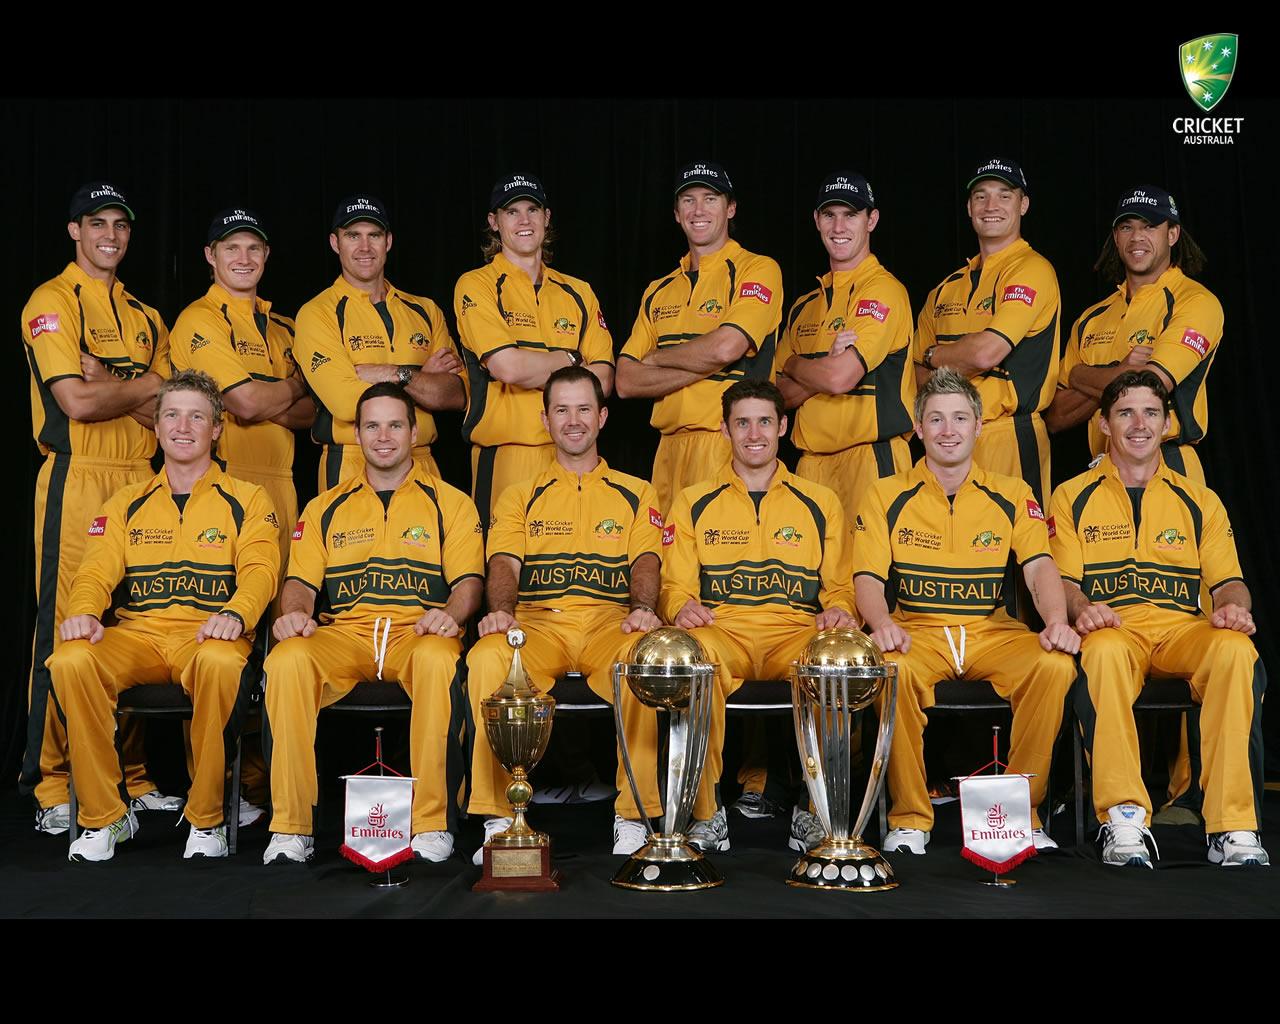 ICC Worlds Top ODI Cricket Teams